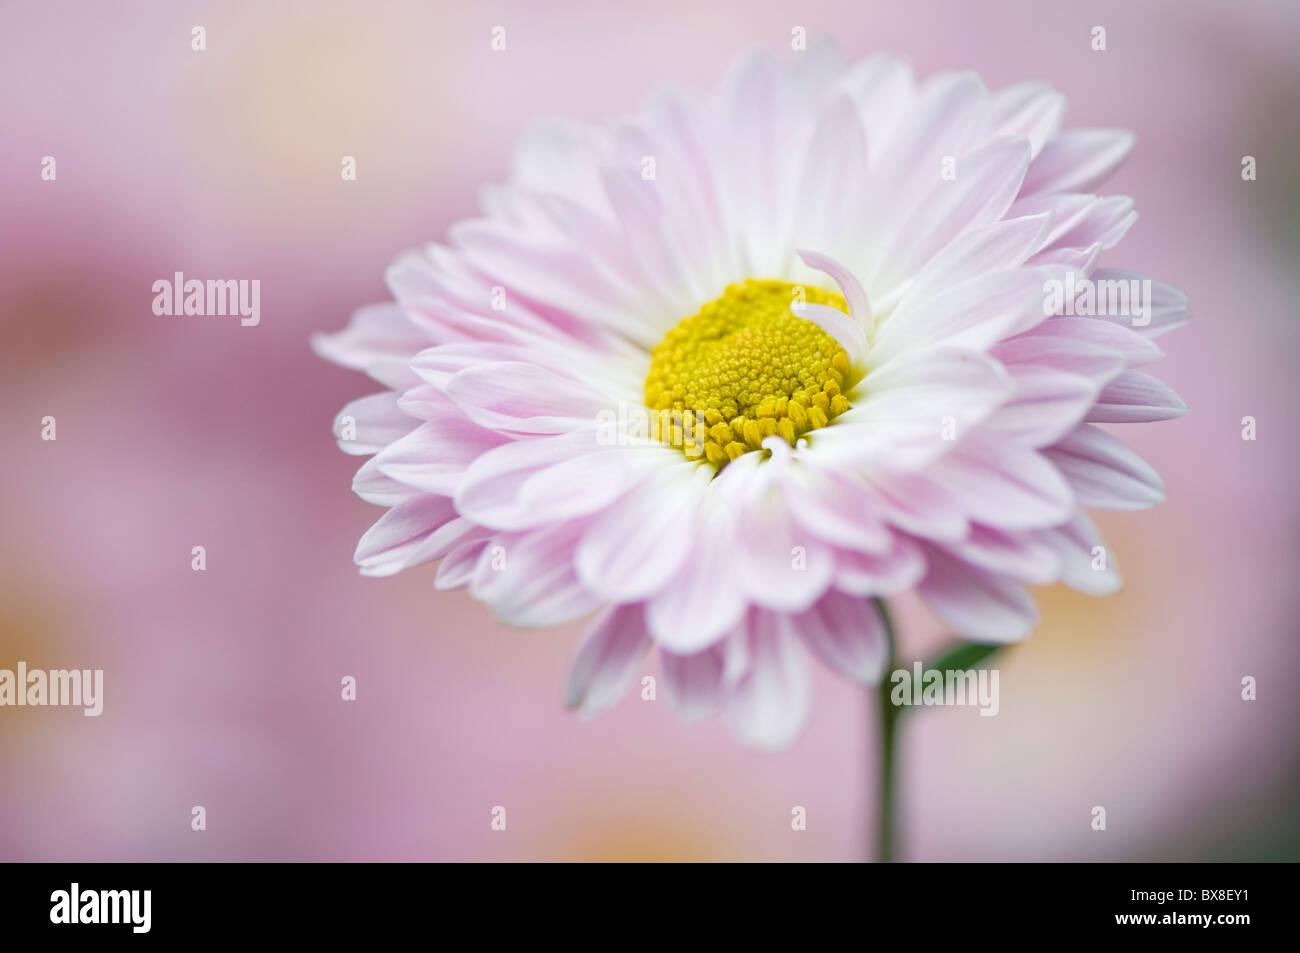 A single English Daisy Flower - Bellis perennis Stock Photo